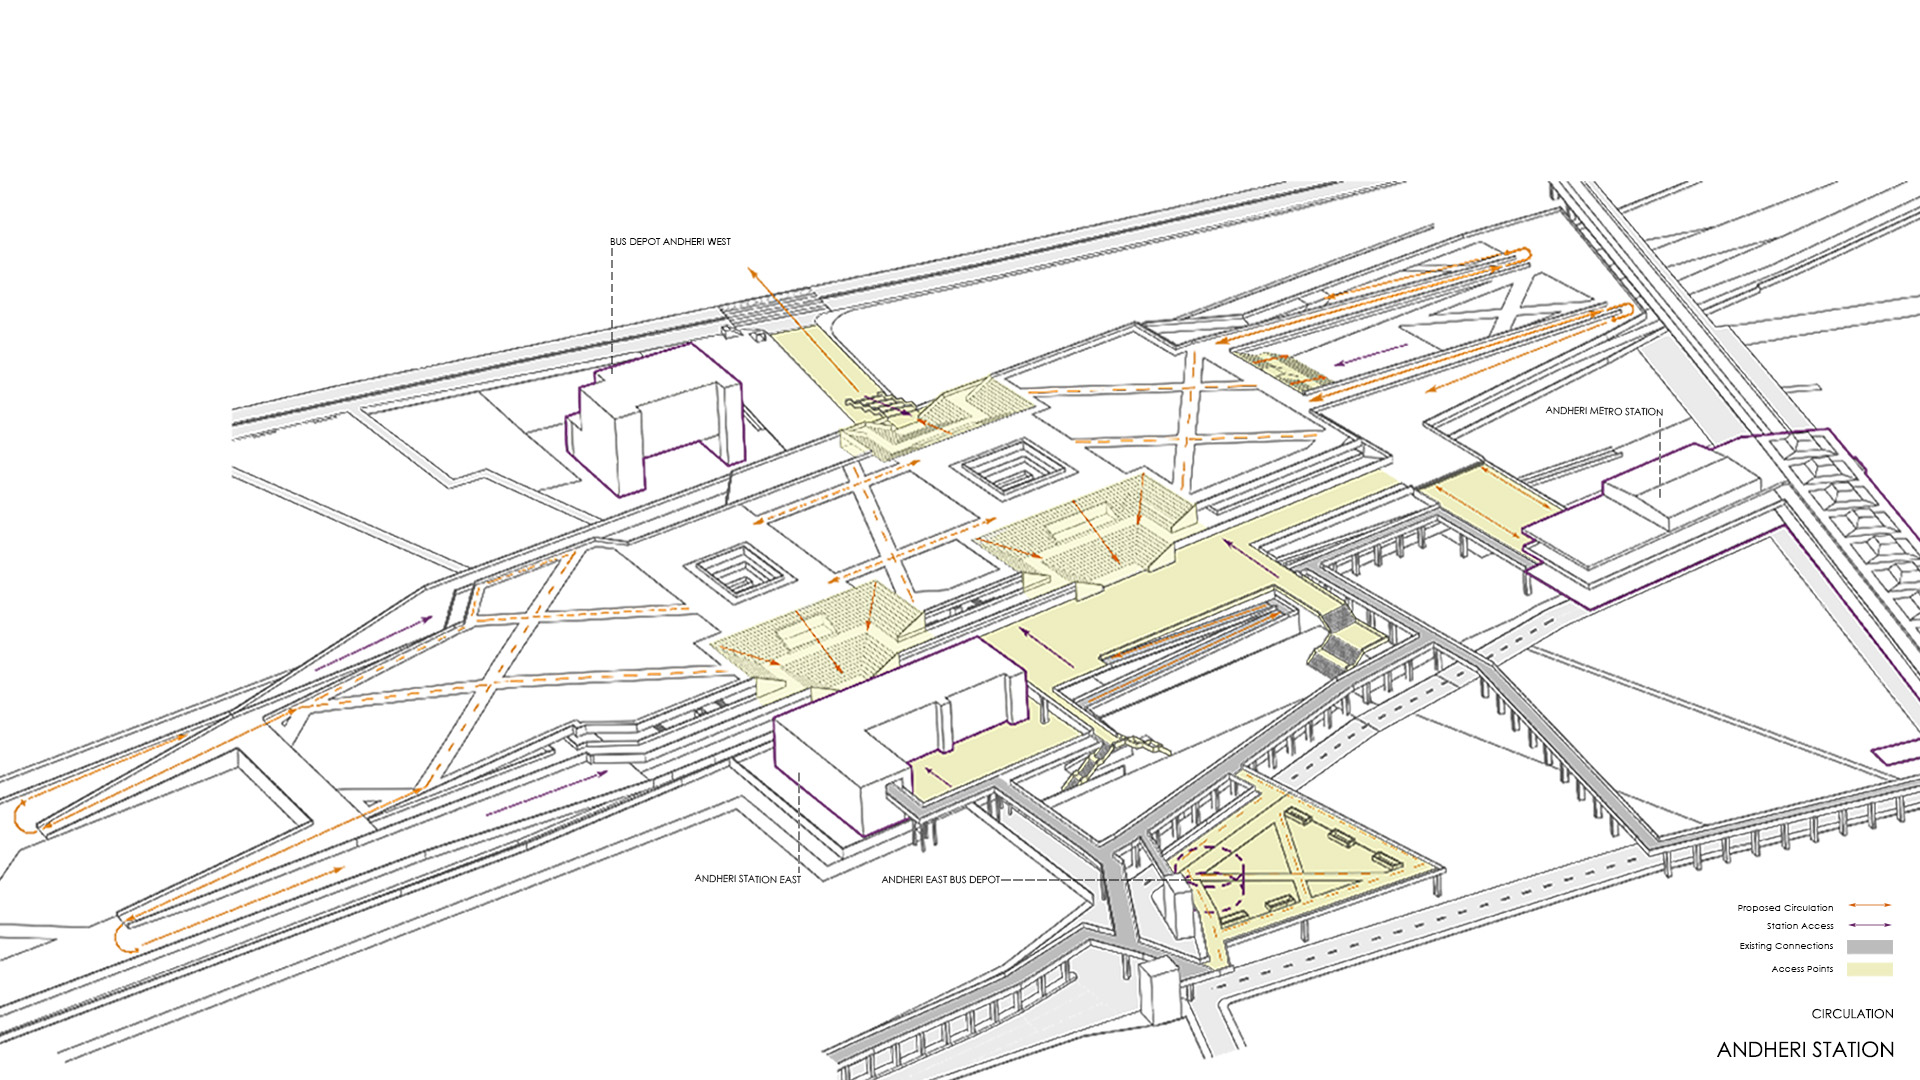 AJA_Andheri Station_03.jpg